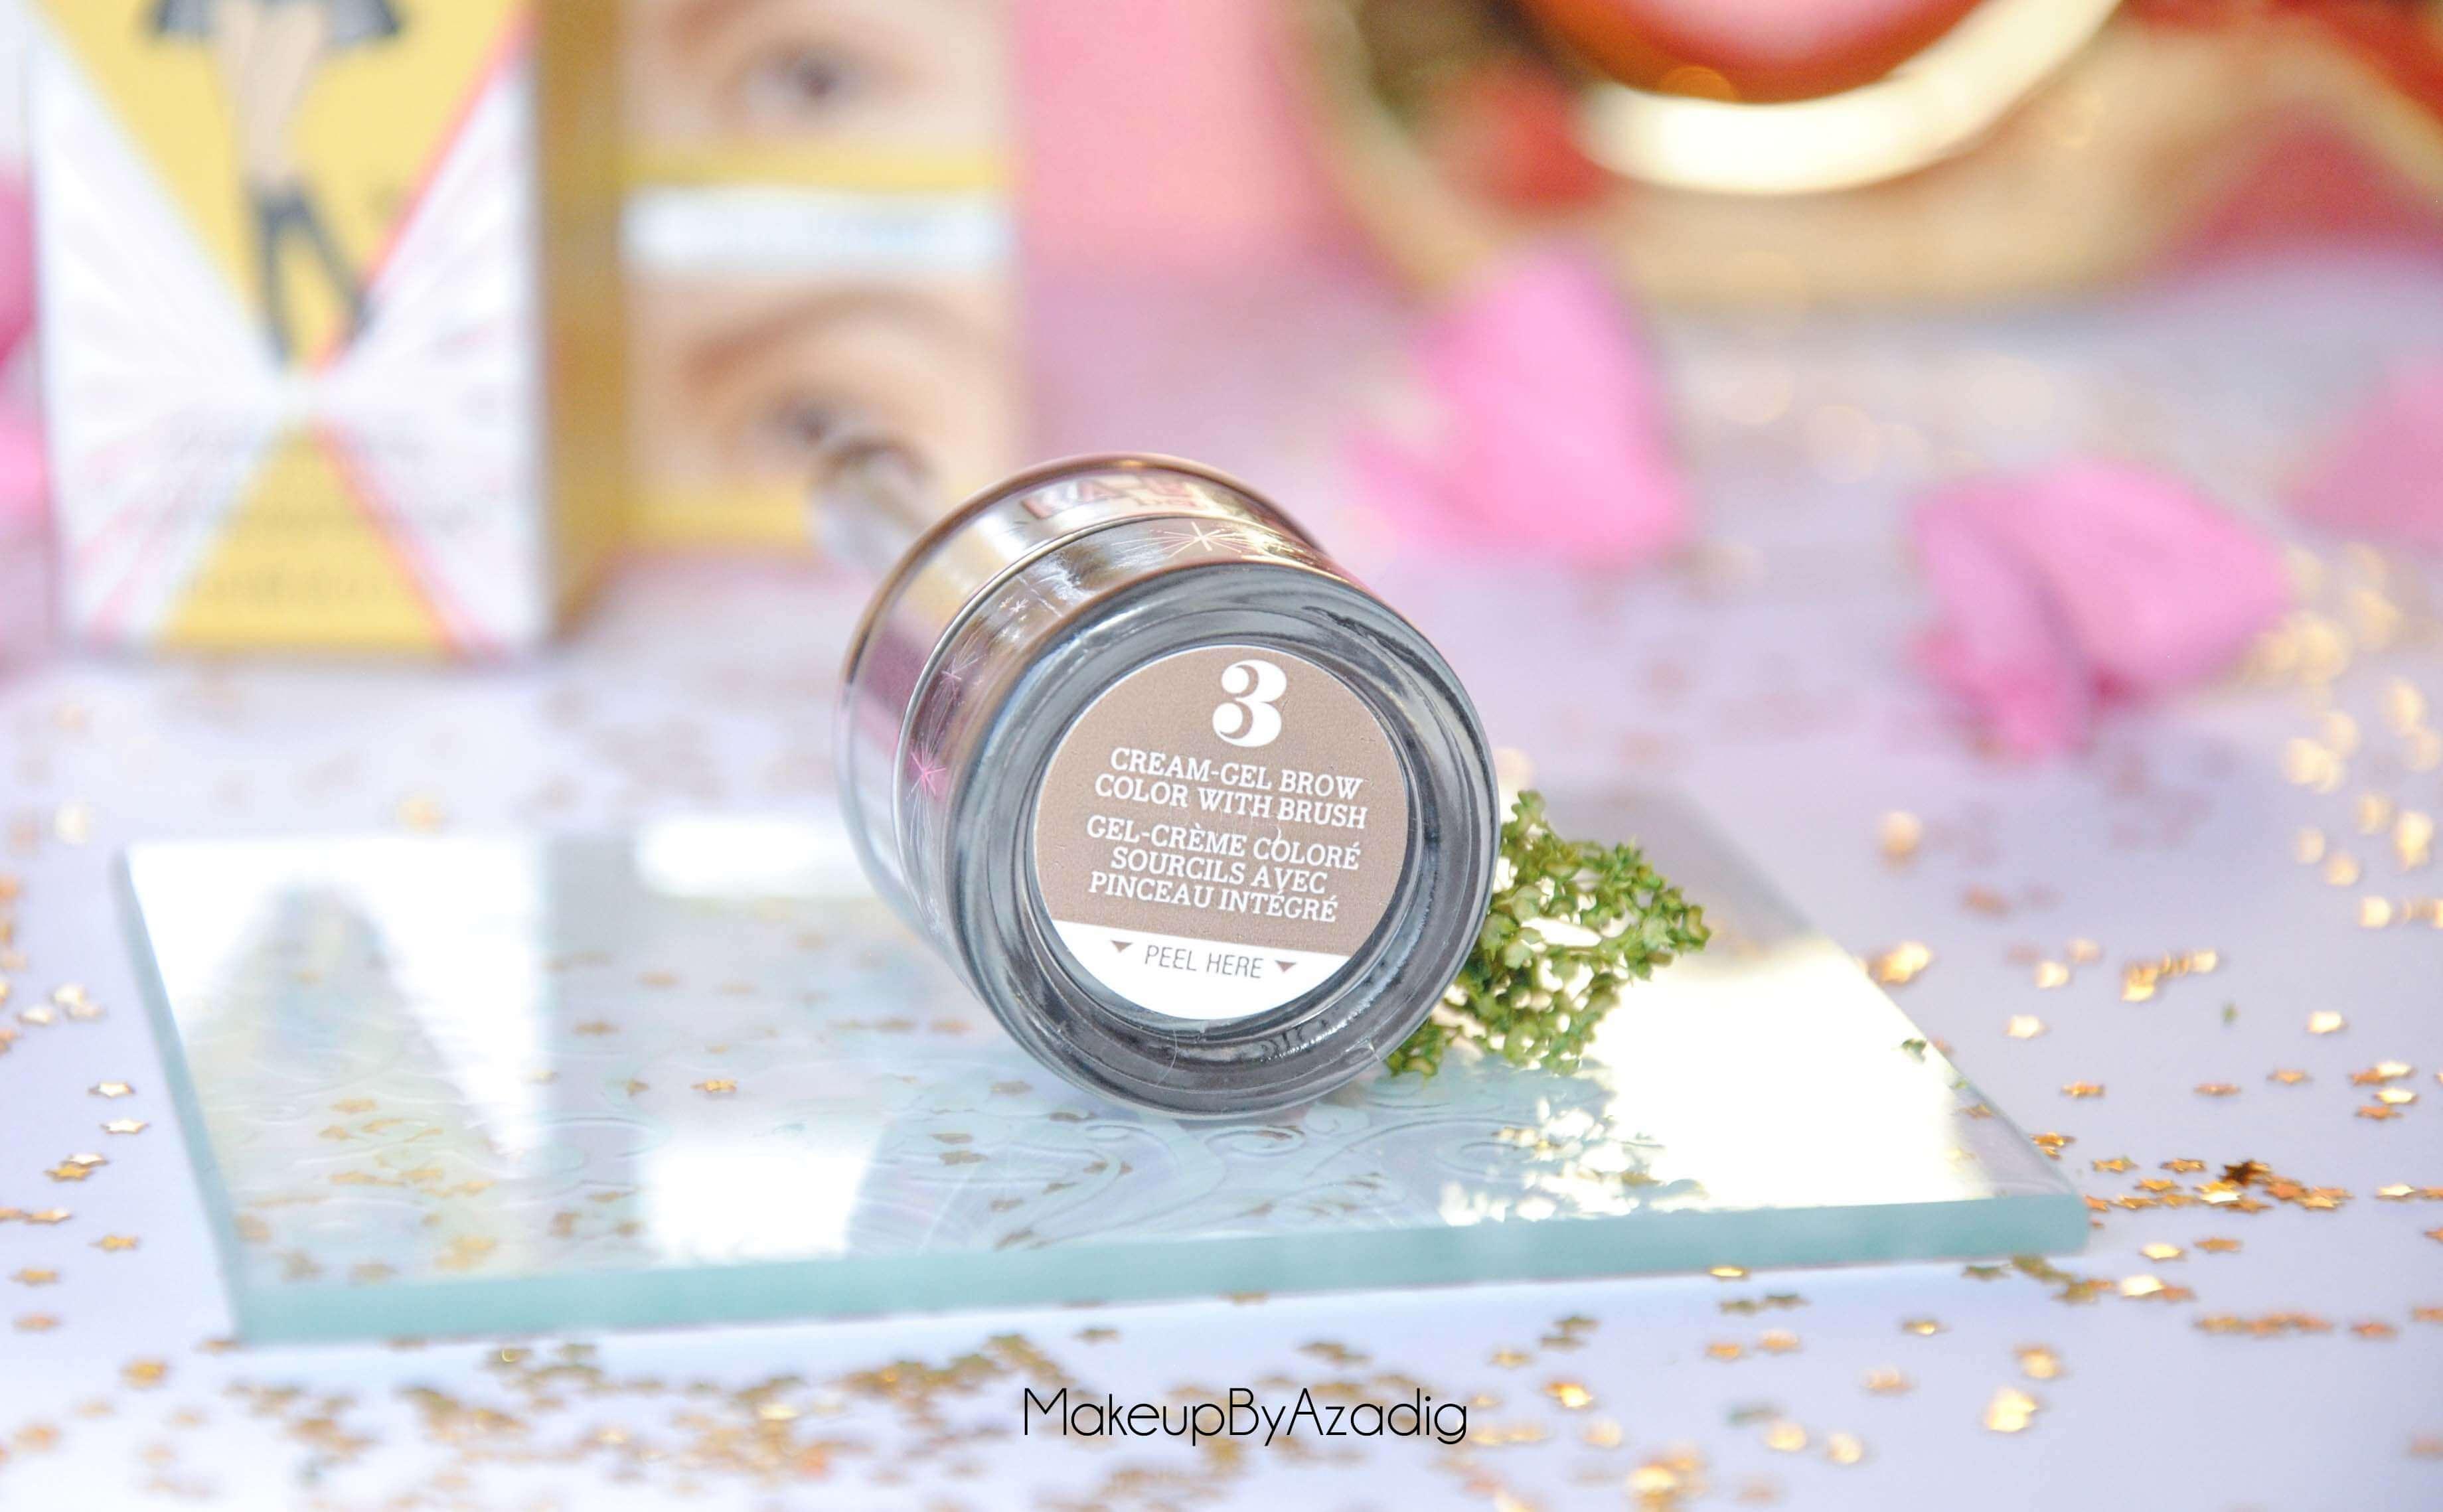 ka-brow-gel-creme-coloration-sourcils-benefit-makeupbyazadig-paris-blog-revue-avis-prix-enjoyphoenix-dessous